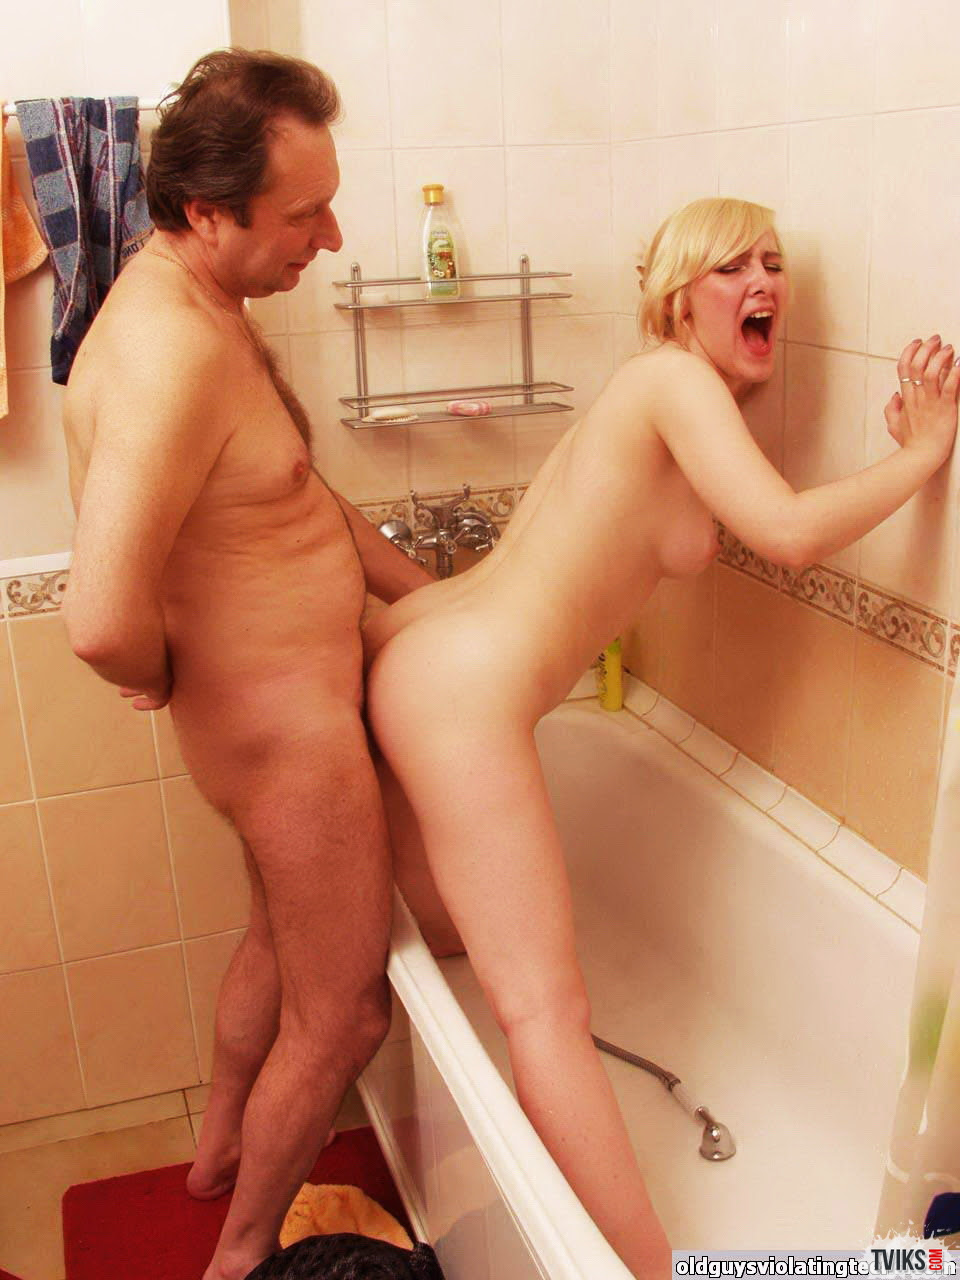 Hirsute Ladies Porn Videos Скачать Мп4 Бесплатно